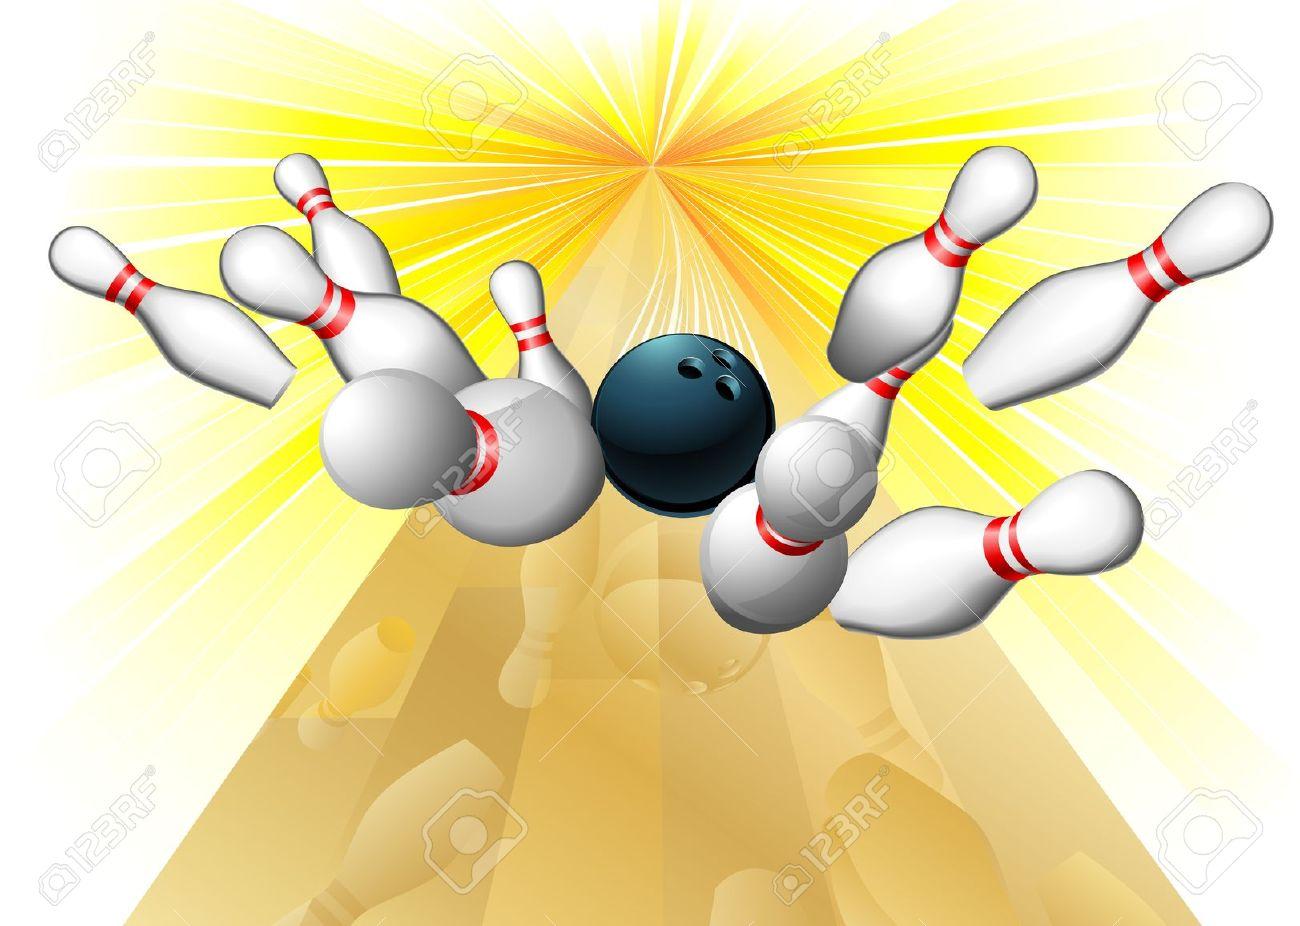 1300x926 Bowling Clipart Bowling Strike